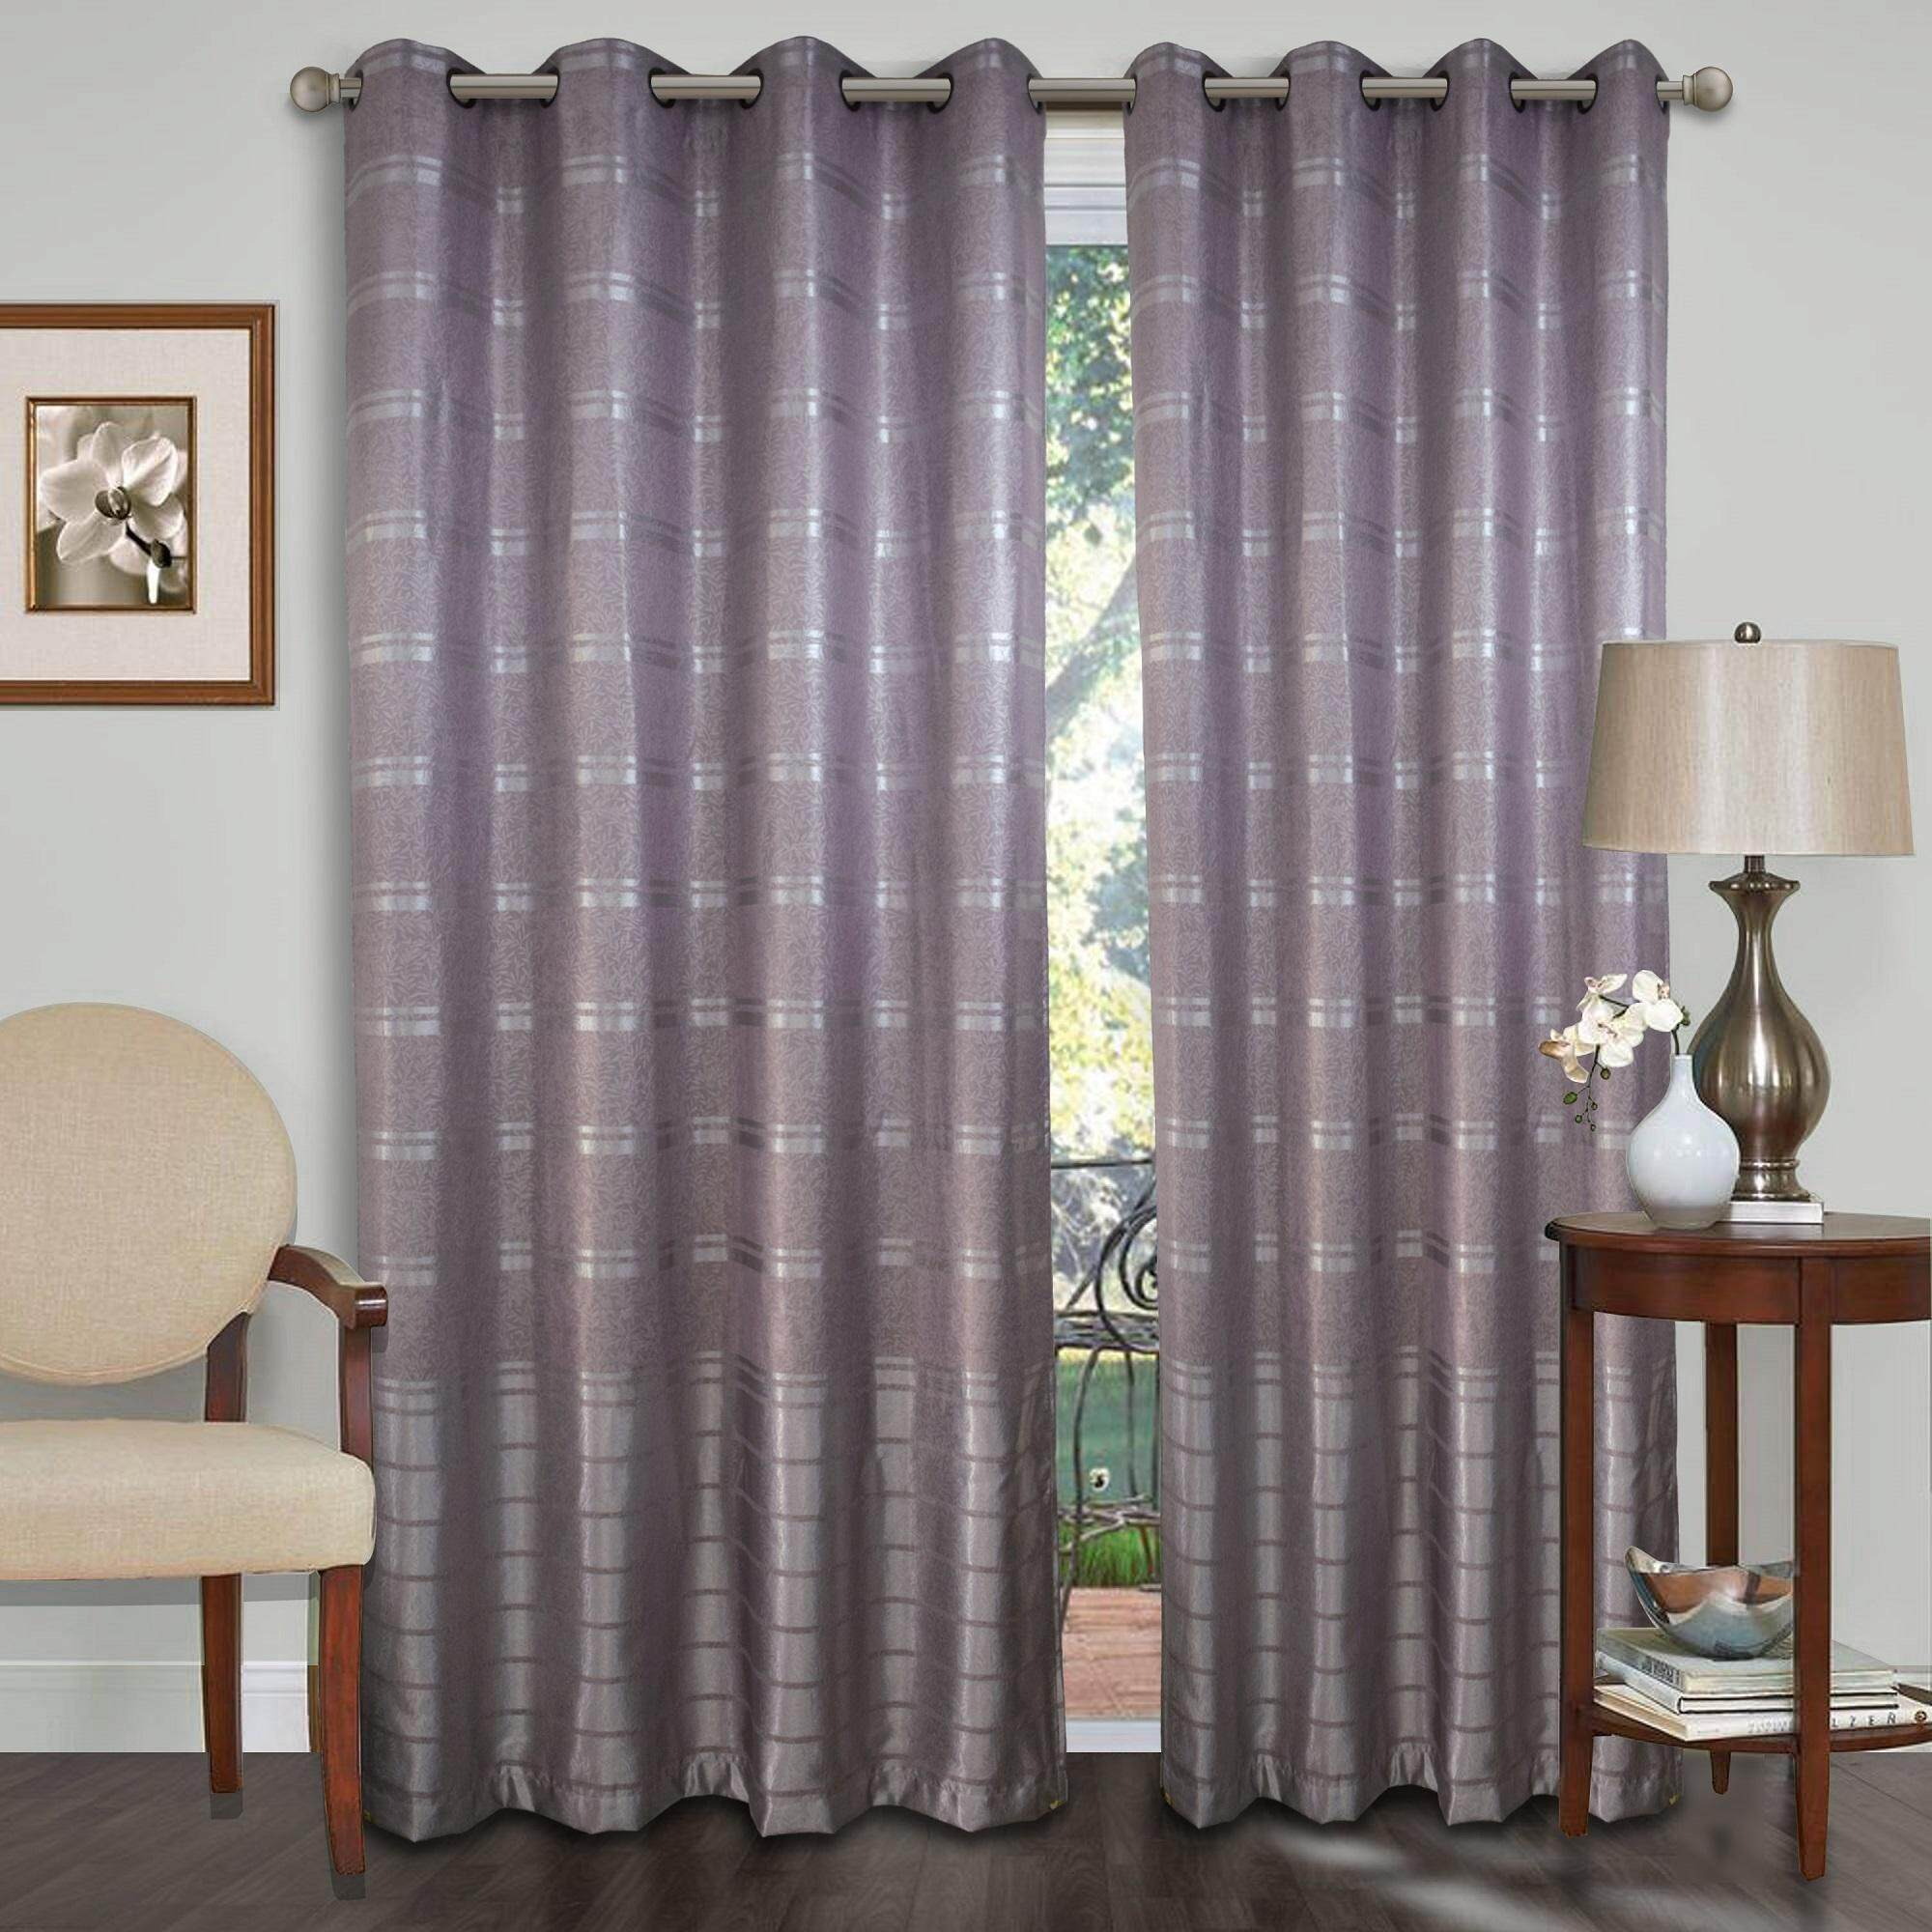 1 Piece Essina Eyelet Curtain Premium Blackout 100cm X 260cm Ariana Fit Window